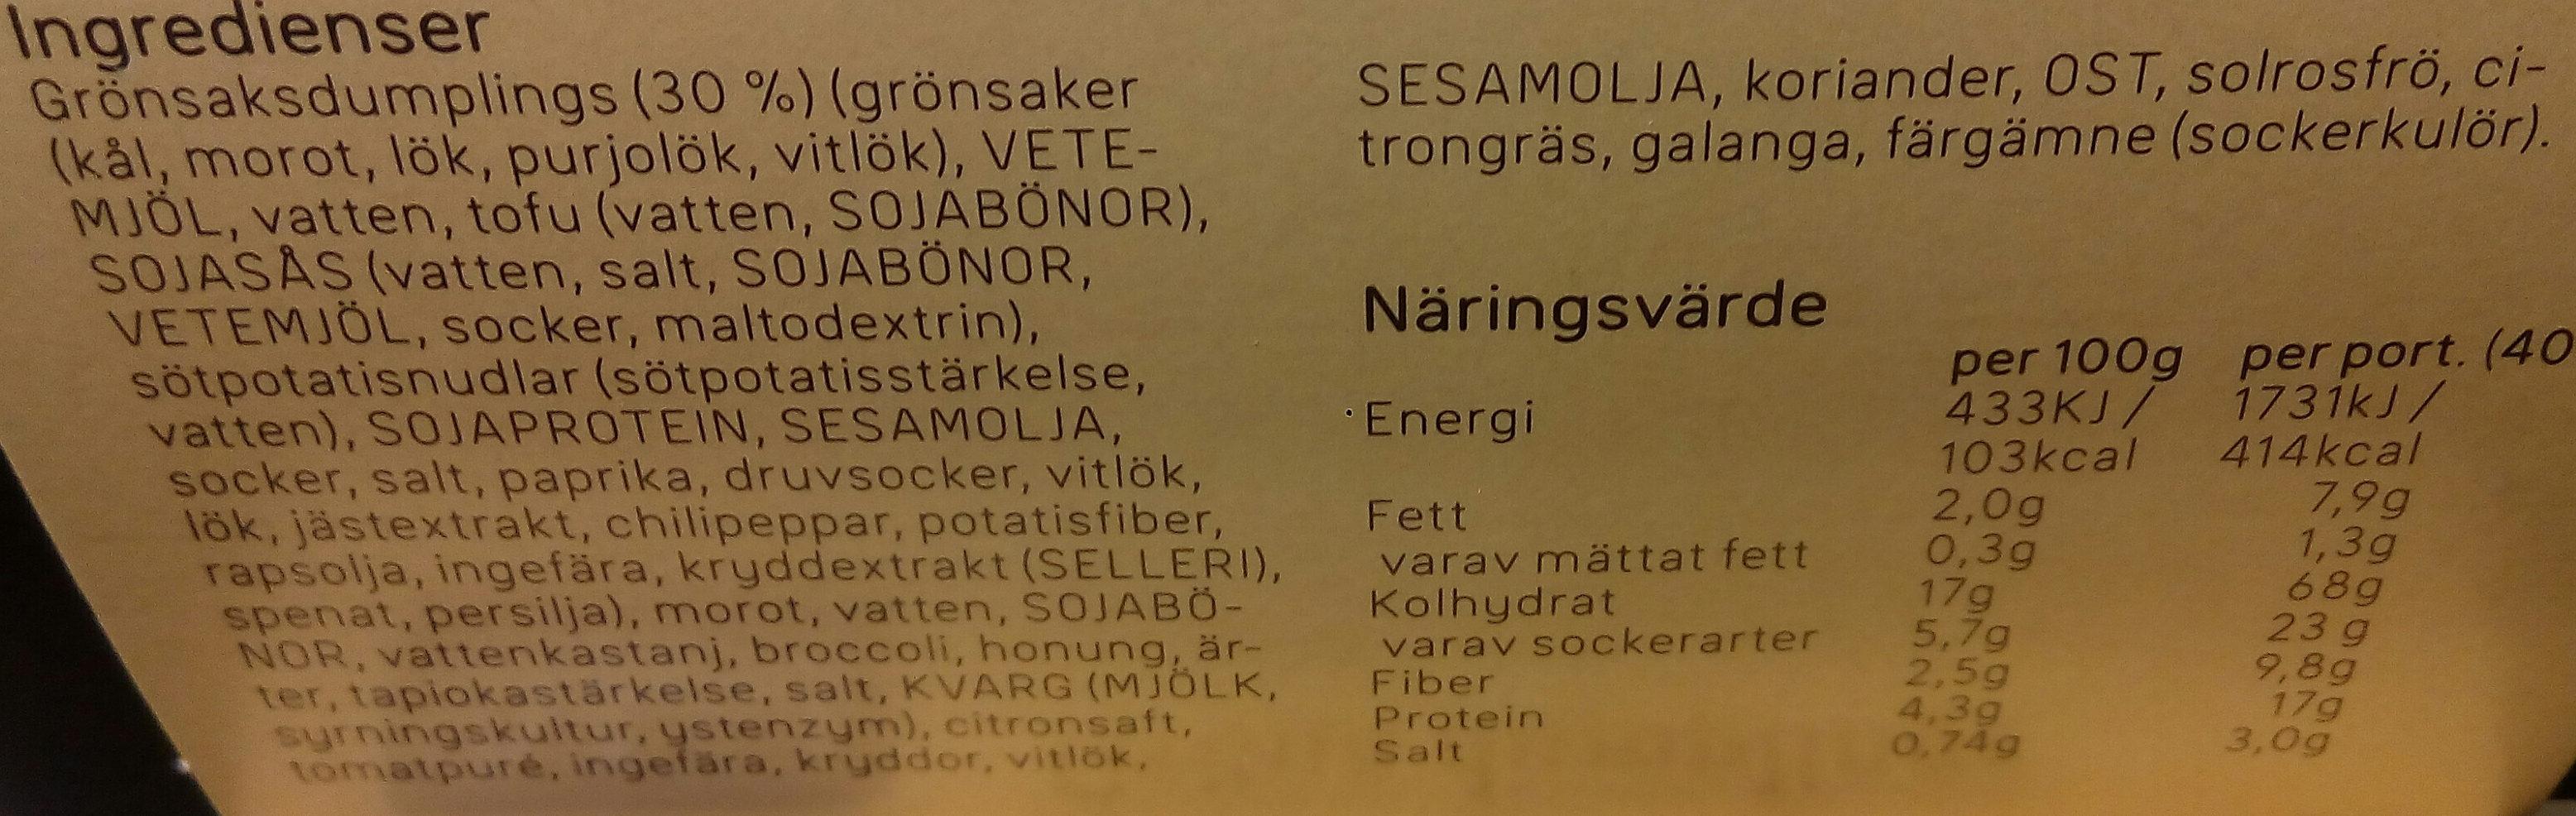 Dafgårds Gröna dumplings - Ingredients